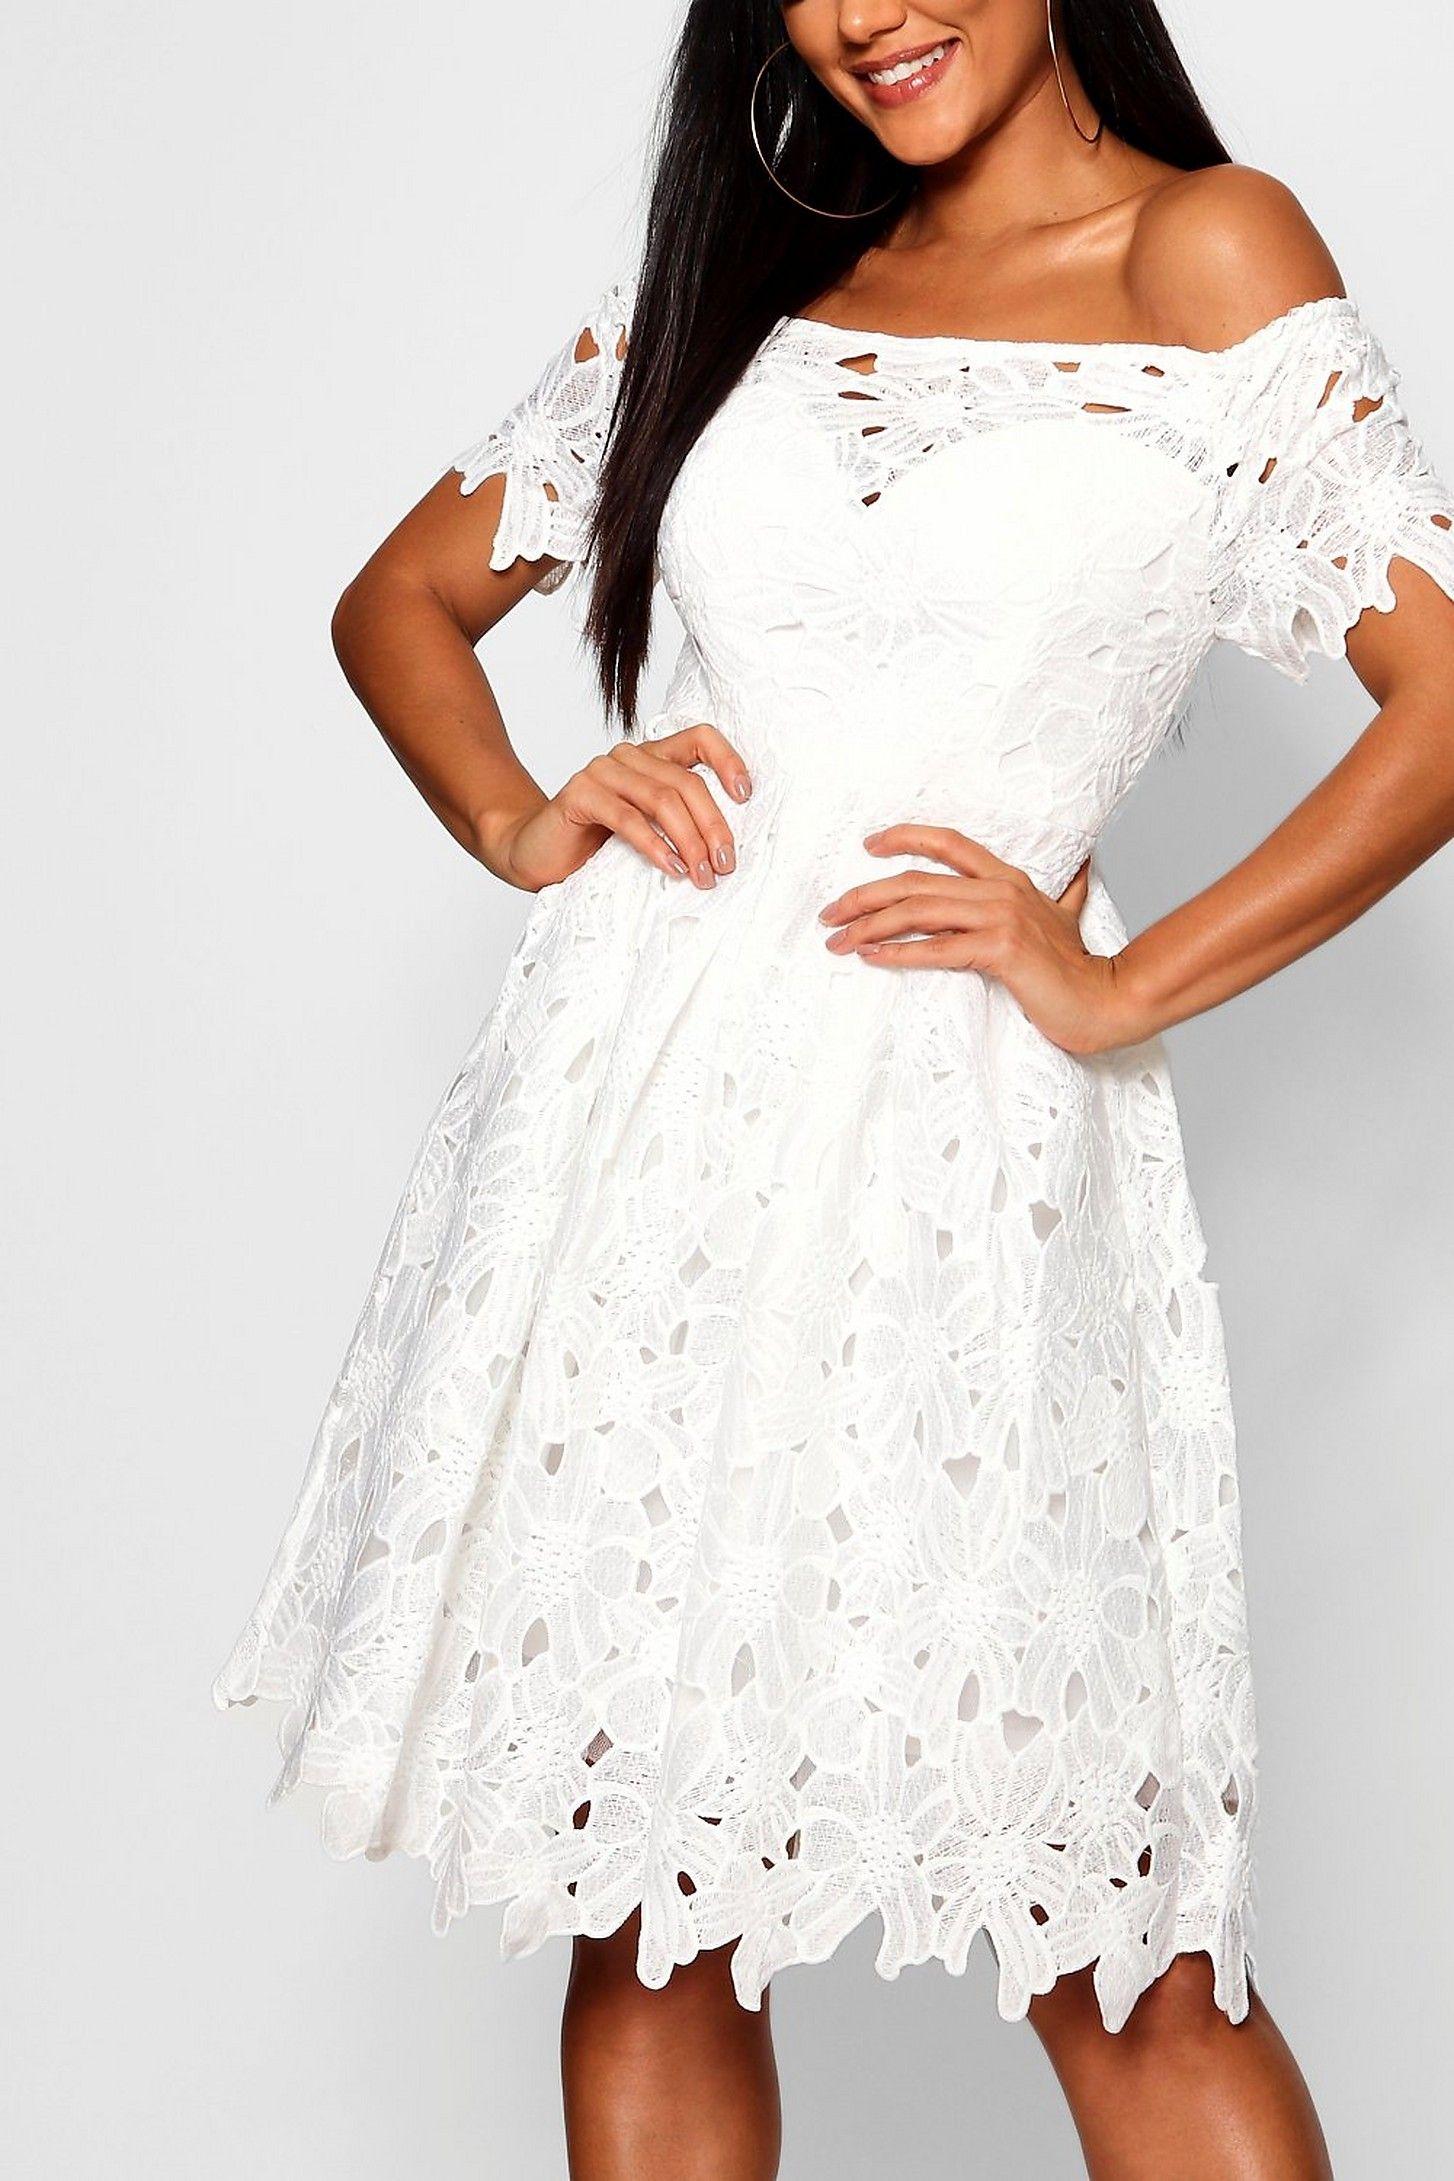 Boutique Off Shoulder Lace Skater Dress Boohoo In 2020 Lace White Dress Short Lace Dress Lace Skater Dress [ 2181 x 1454 Pixel ]